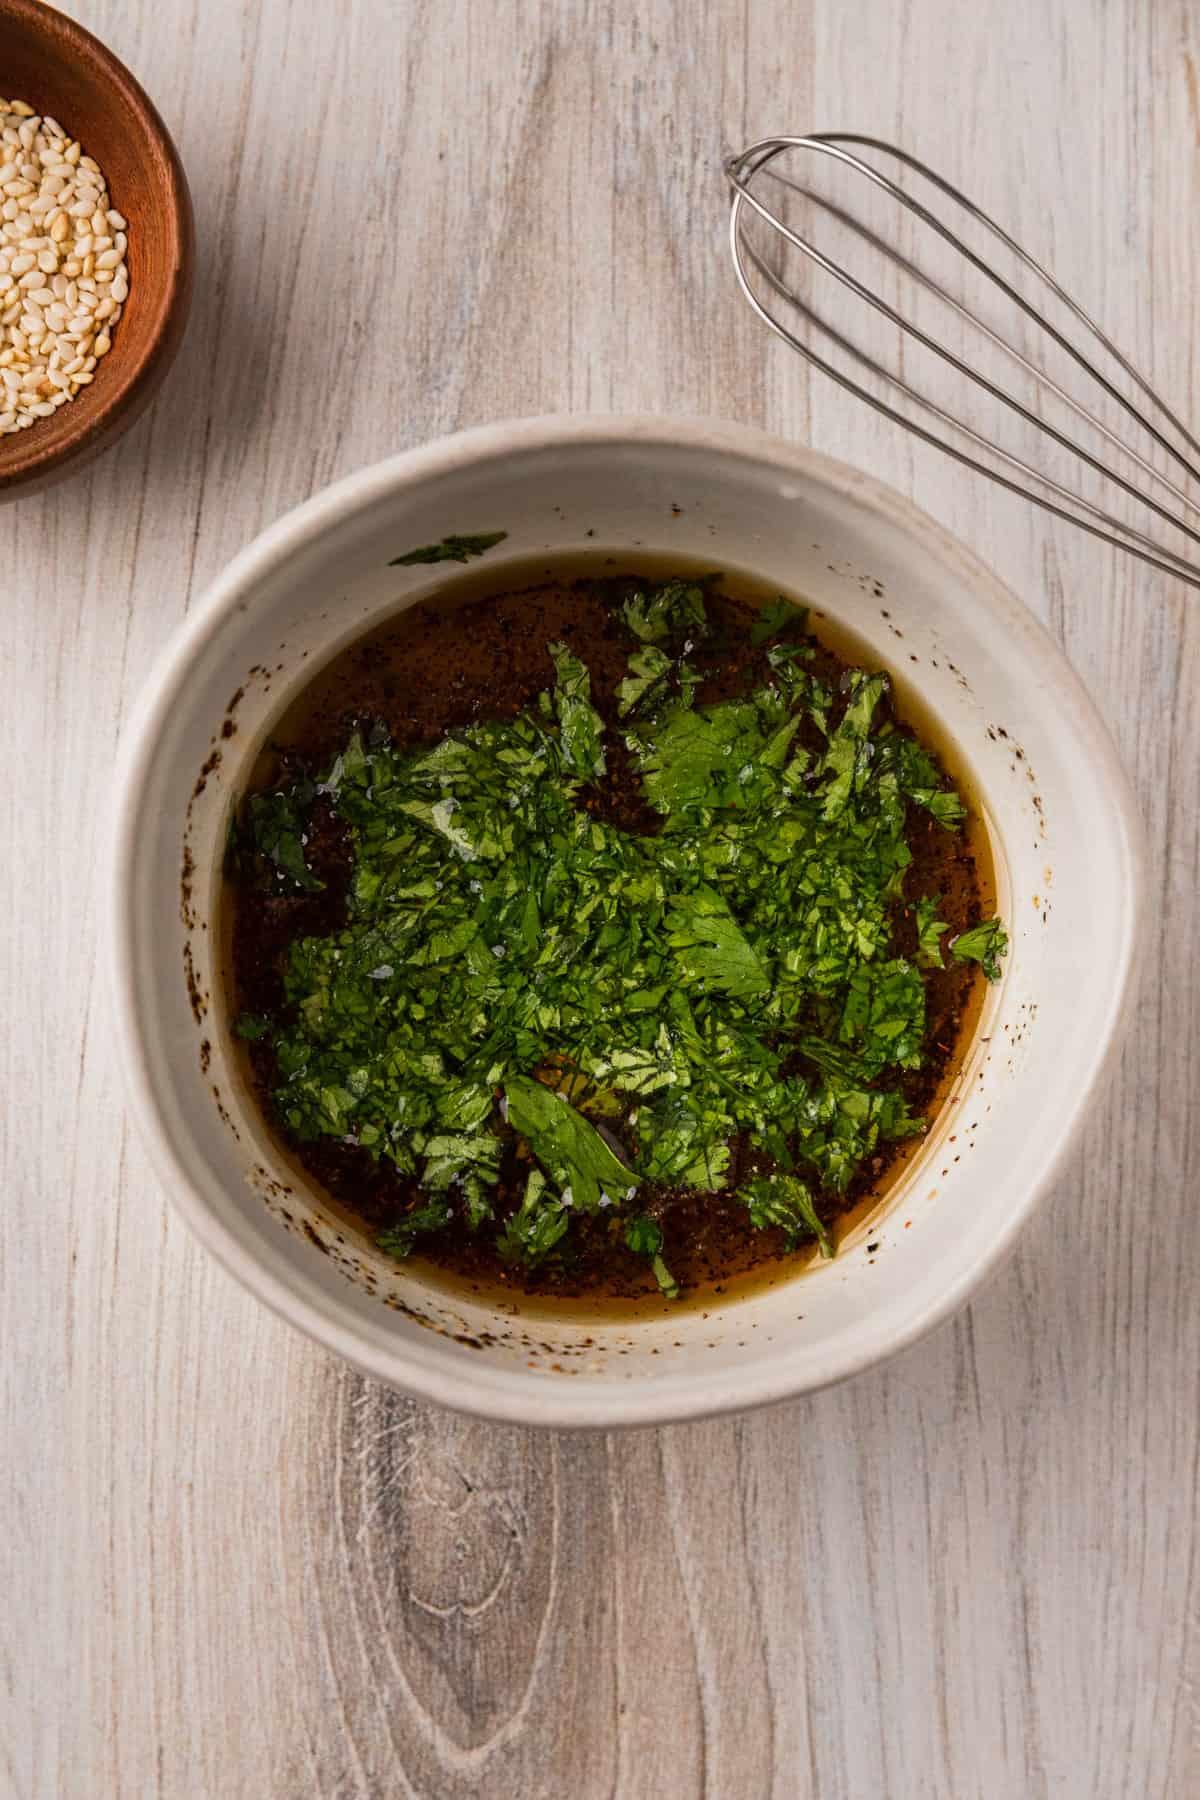 a bowl of vinaigrette with chopped cilantro.